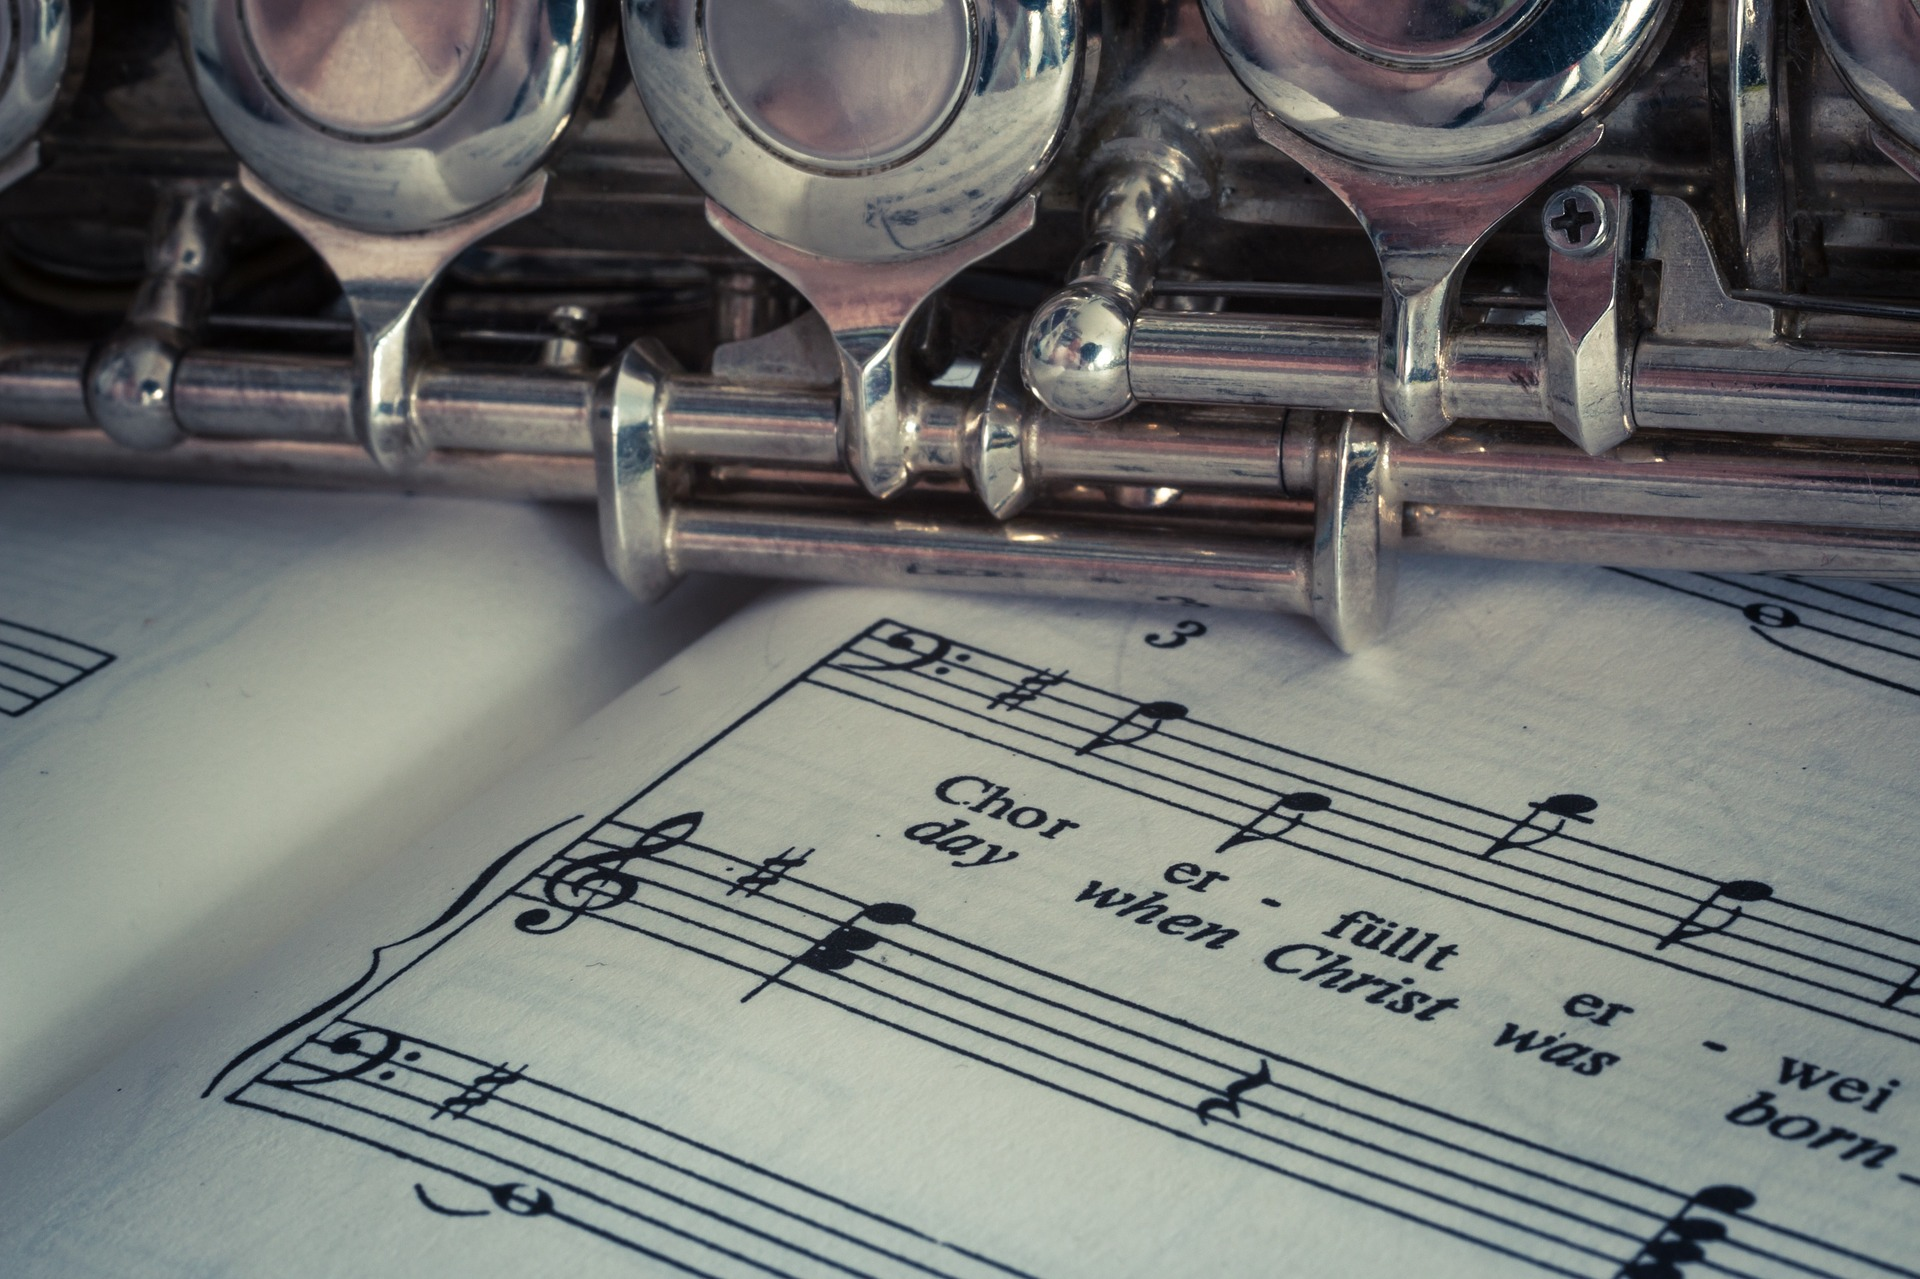 flauta, शीट संगीत, संगीत वाद्य �बांसुरी��्टाफ, संगीत नोट्स, flauta travesera, रजत - HD वॉलपेपर - प्रोफेसर-falken.com